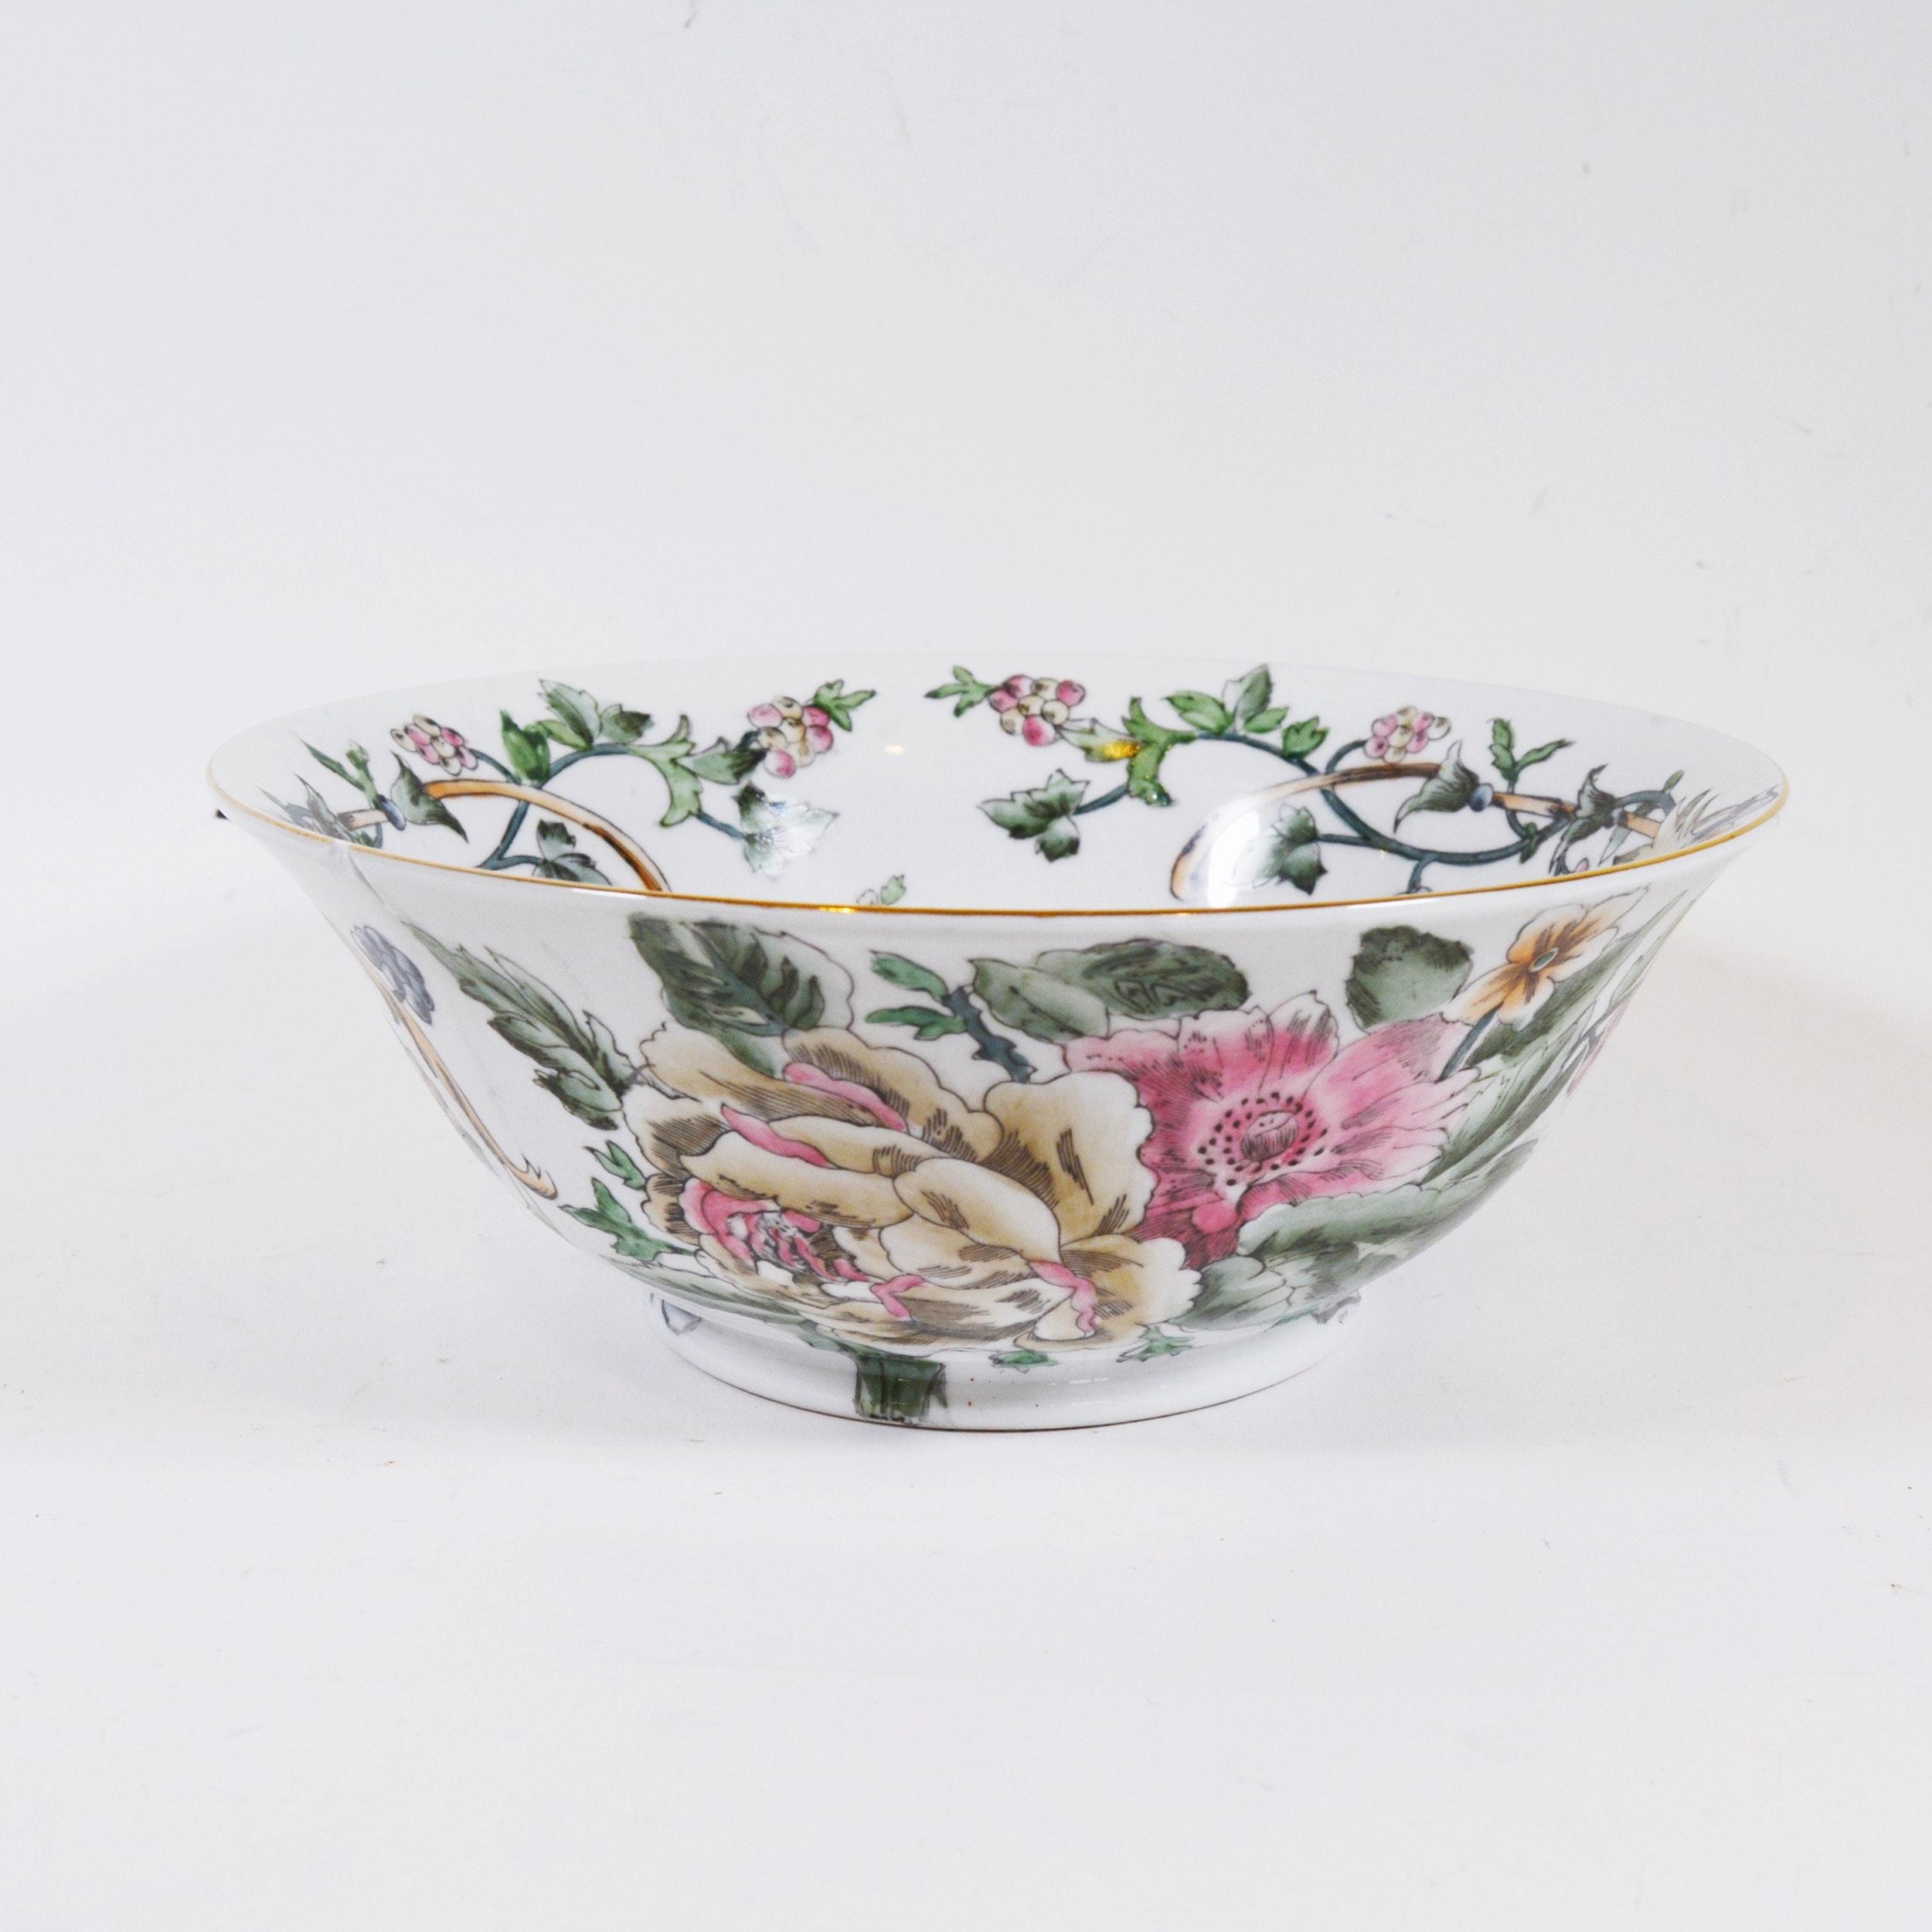 Chinese Macau Painted Porcelain Decor Bowl